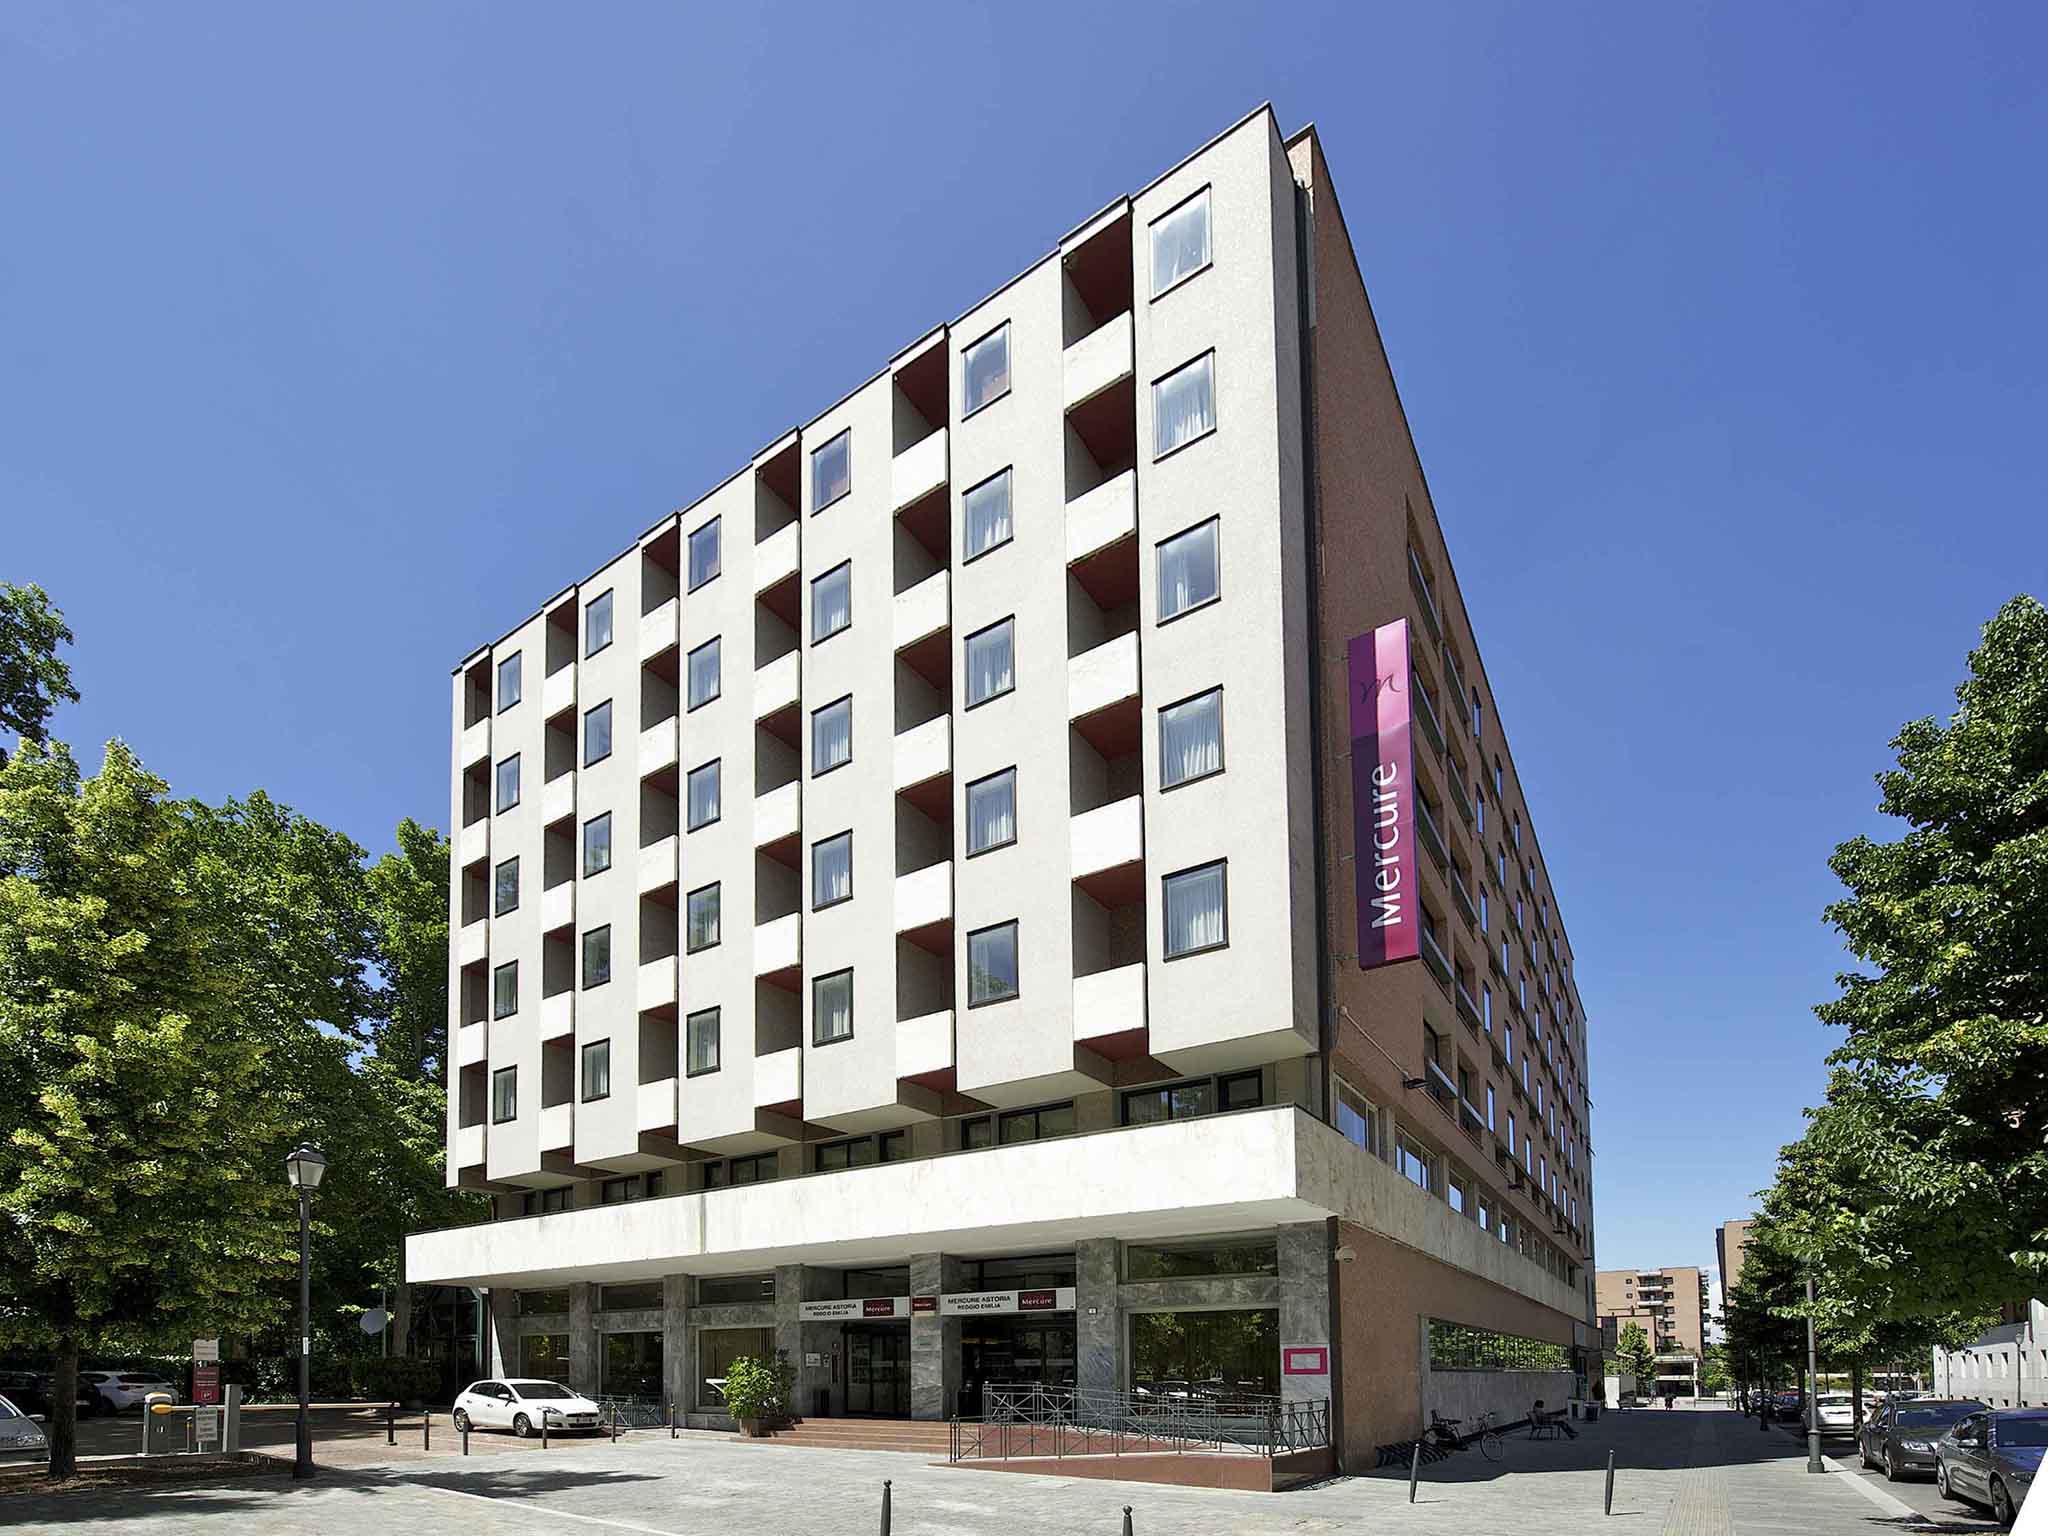 Hotell – Mercure Reggio Emilia Centro Astoria